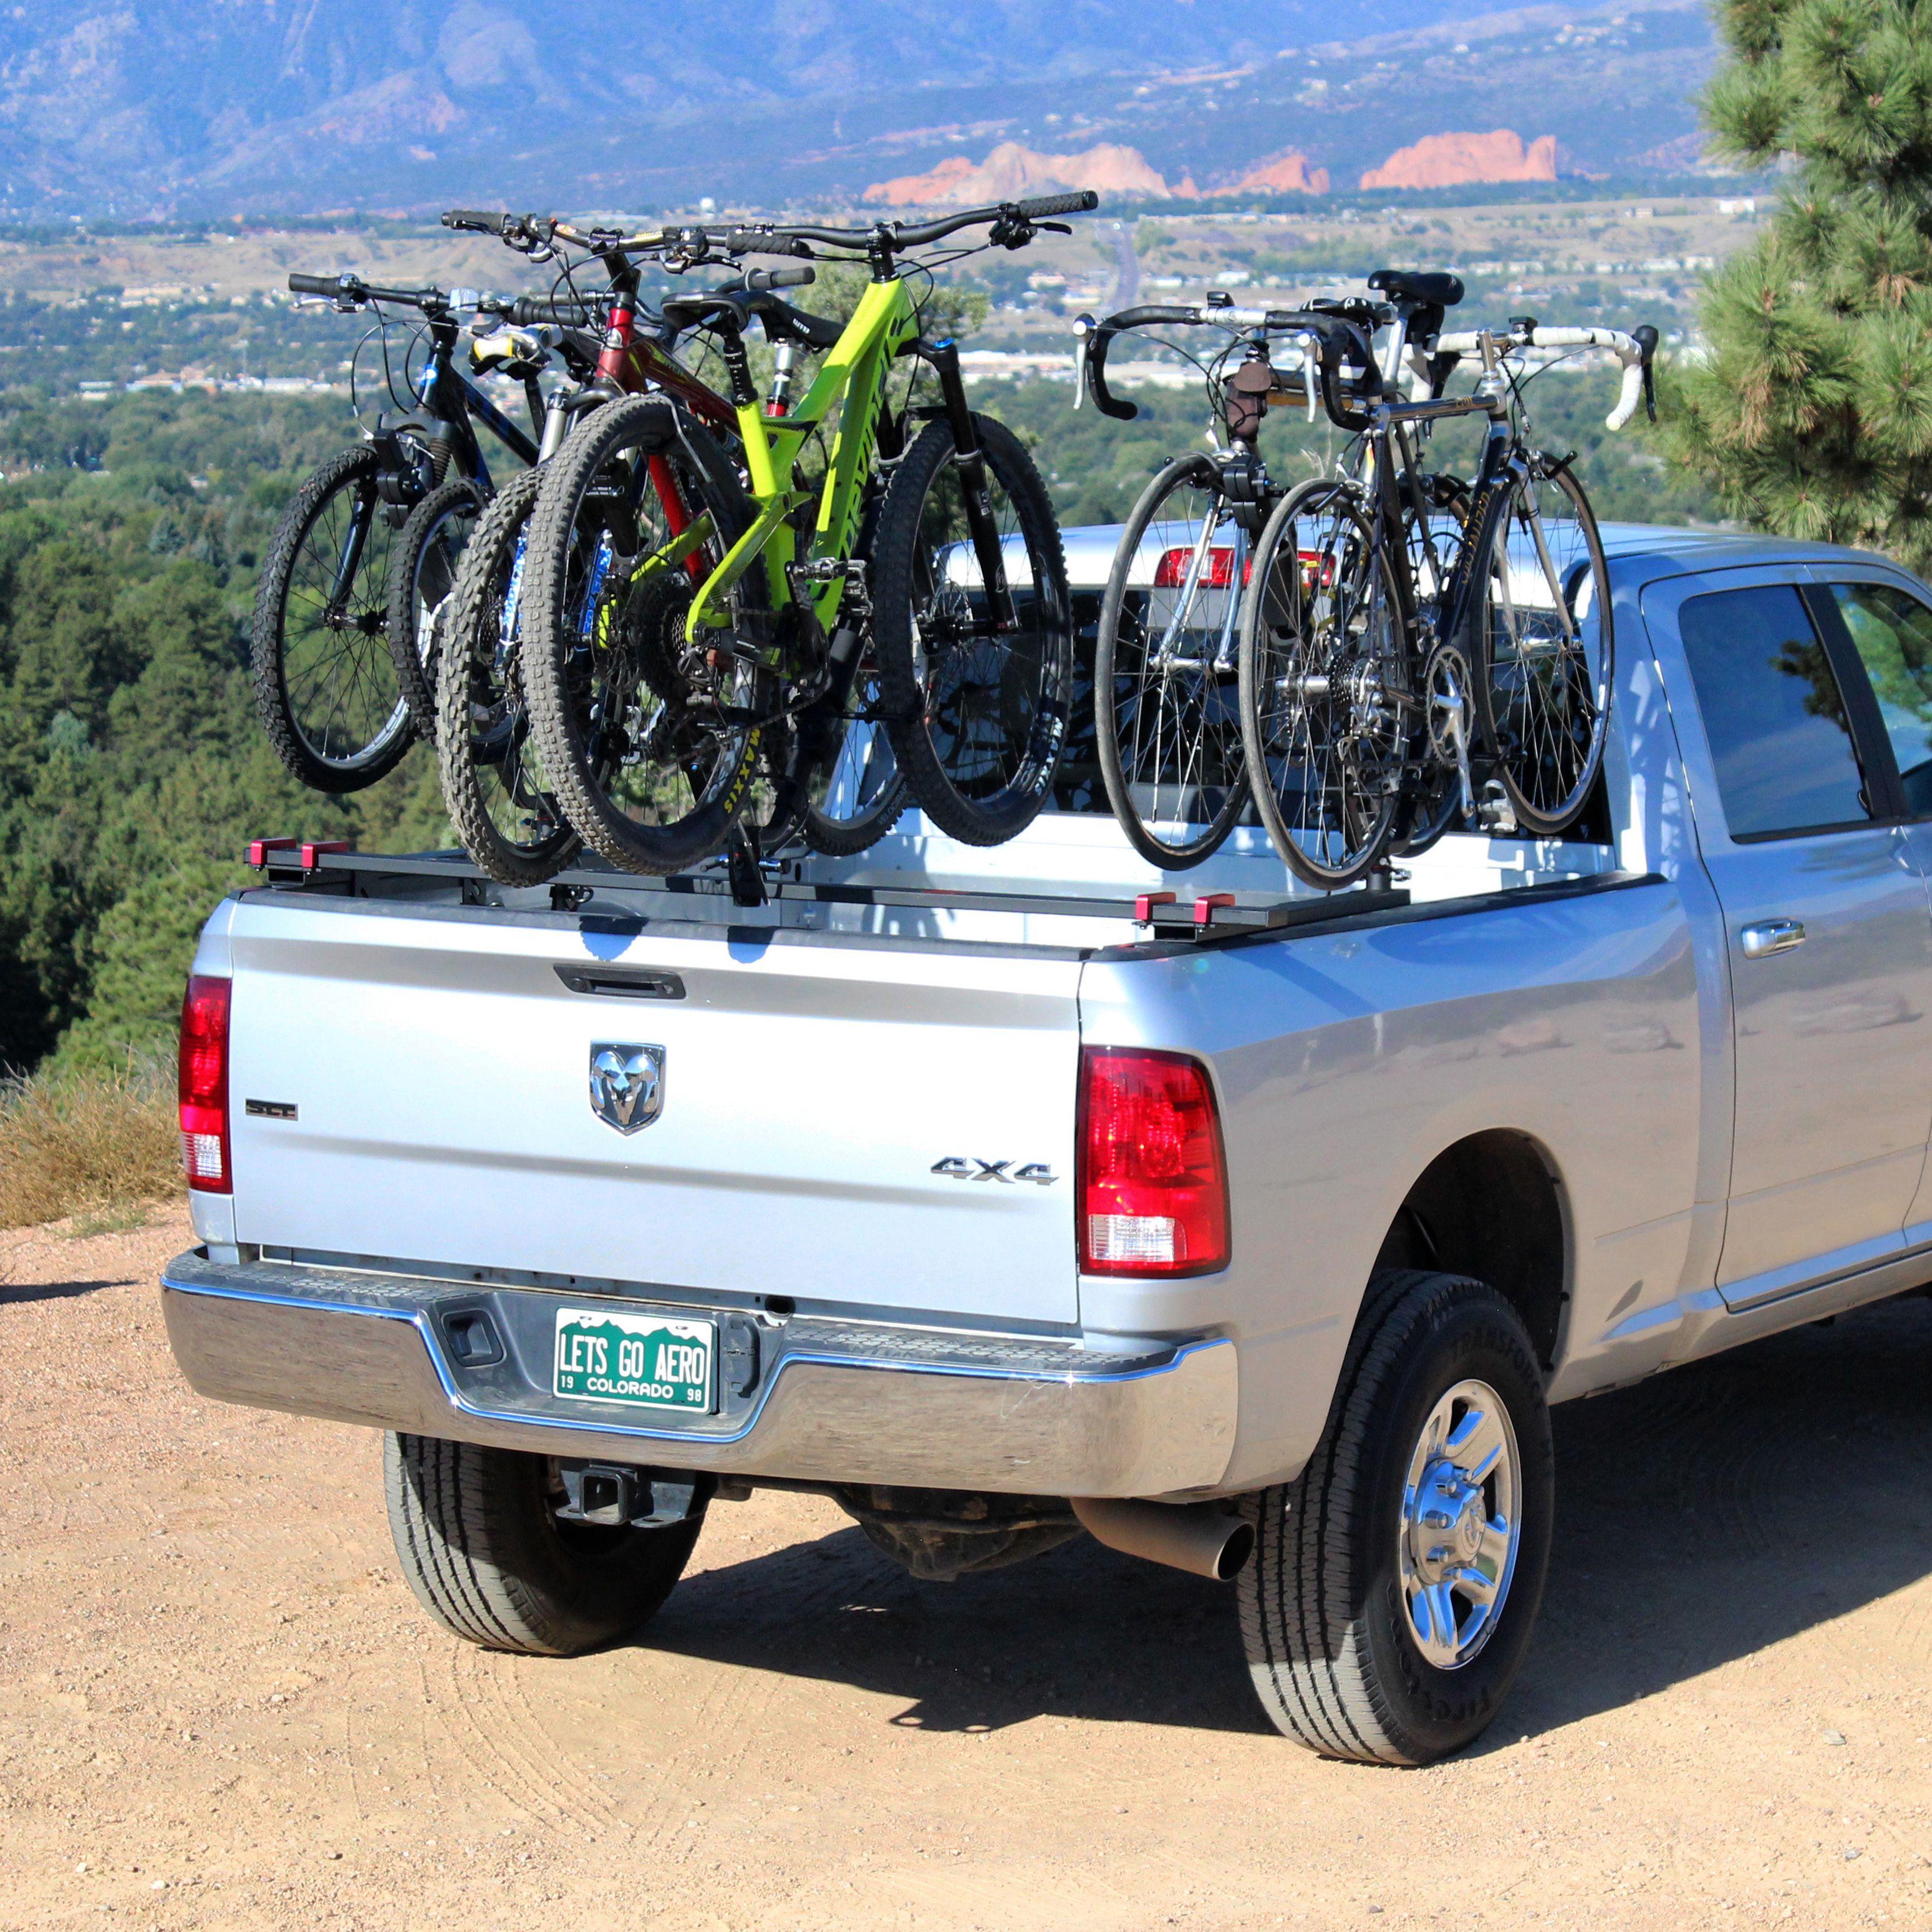 nelson truck mounts carry six bikes